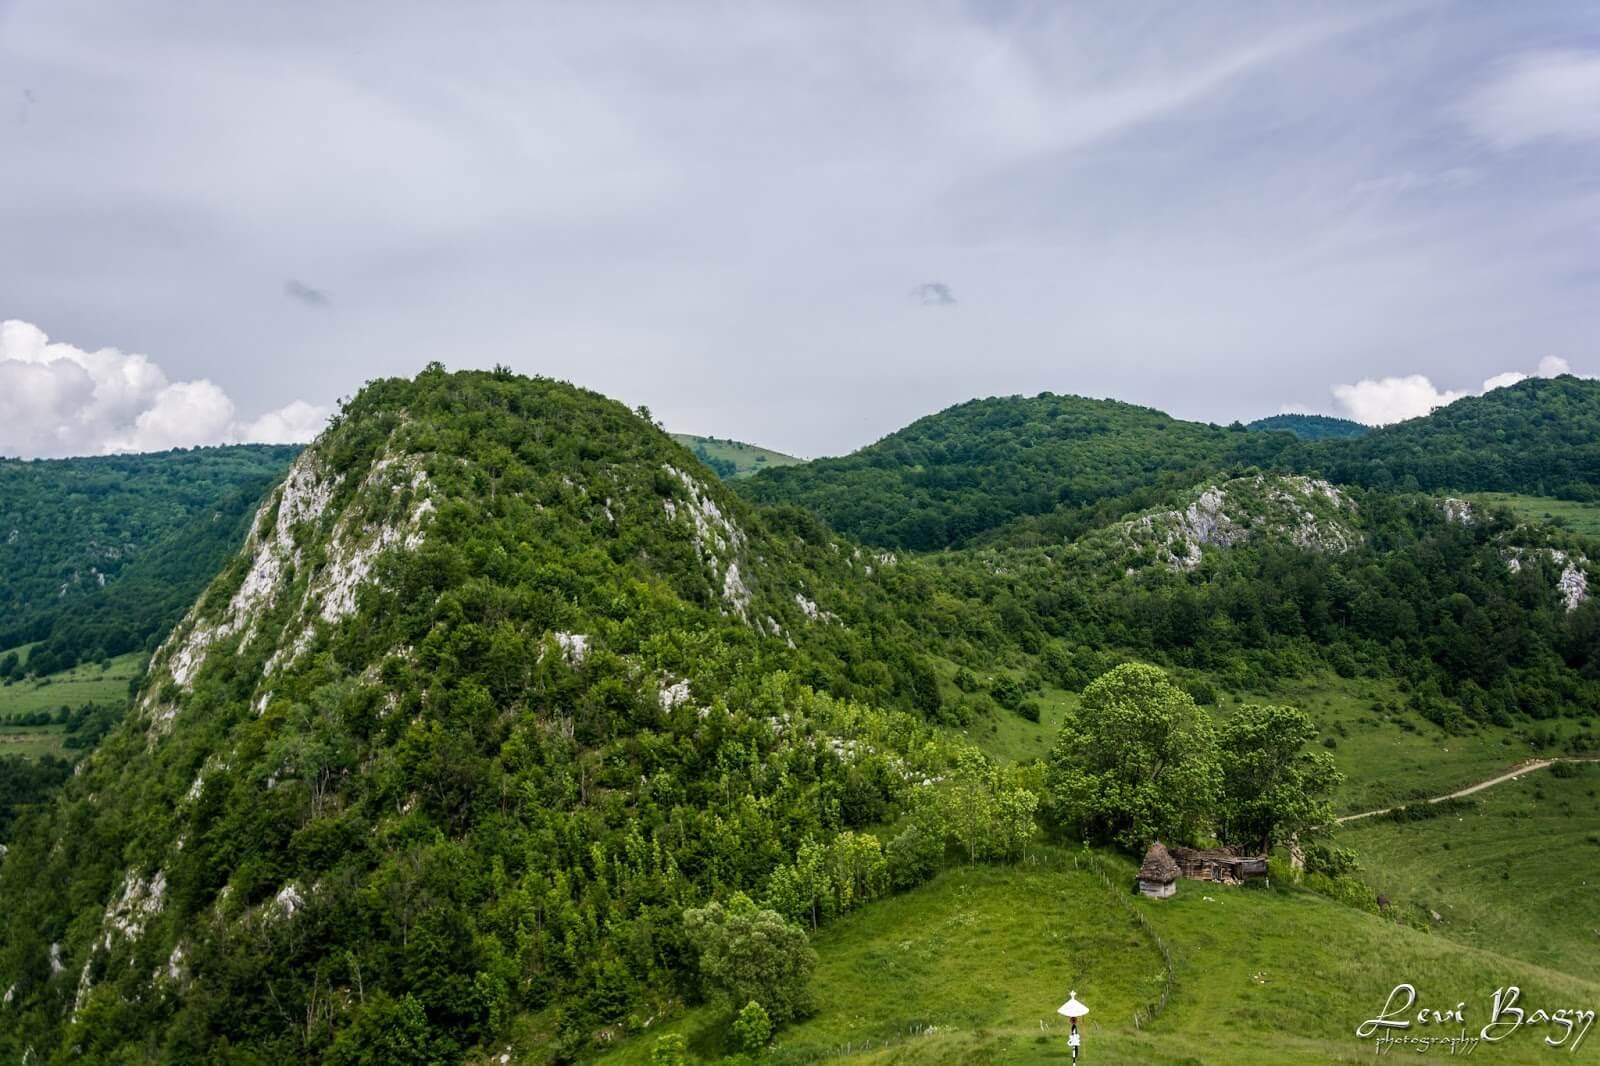 Drumul spre Valea Poienii - Levi Bagy Photography